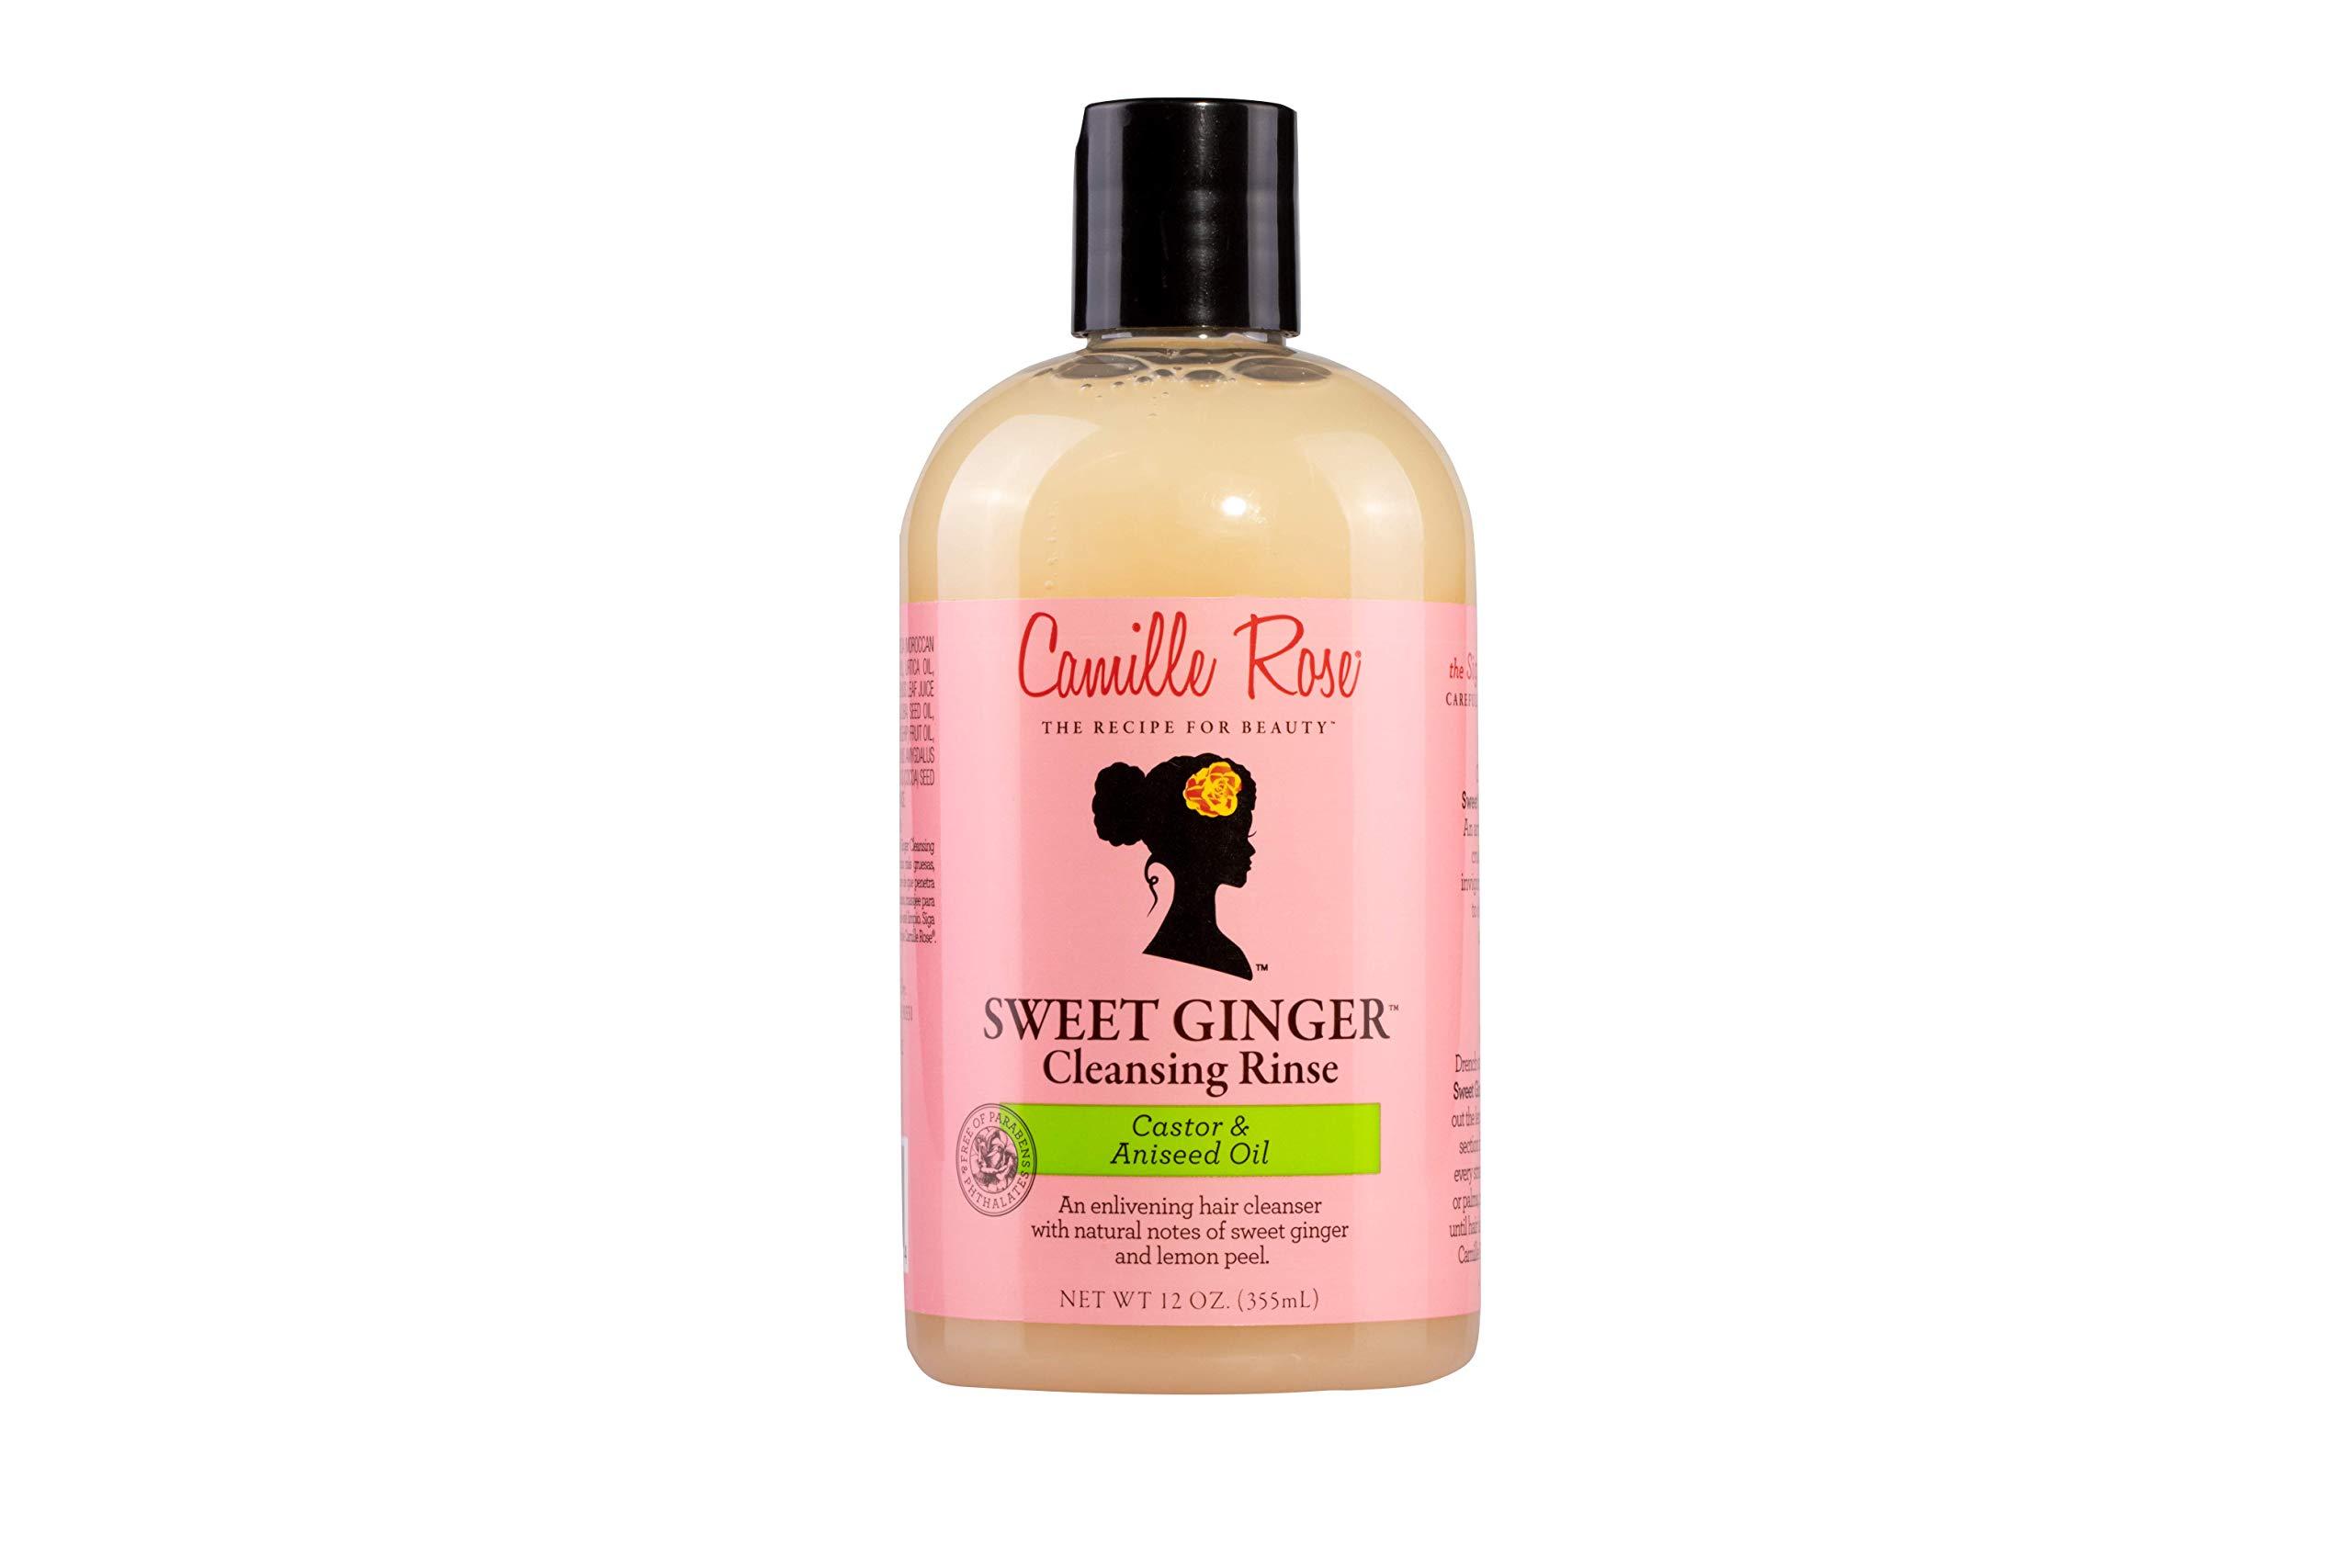 Camille Rose Sweet Ginger Cleansing Rinse, 12 fl oz